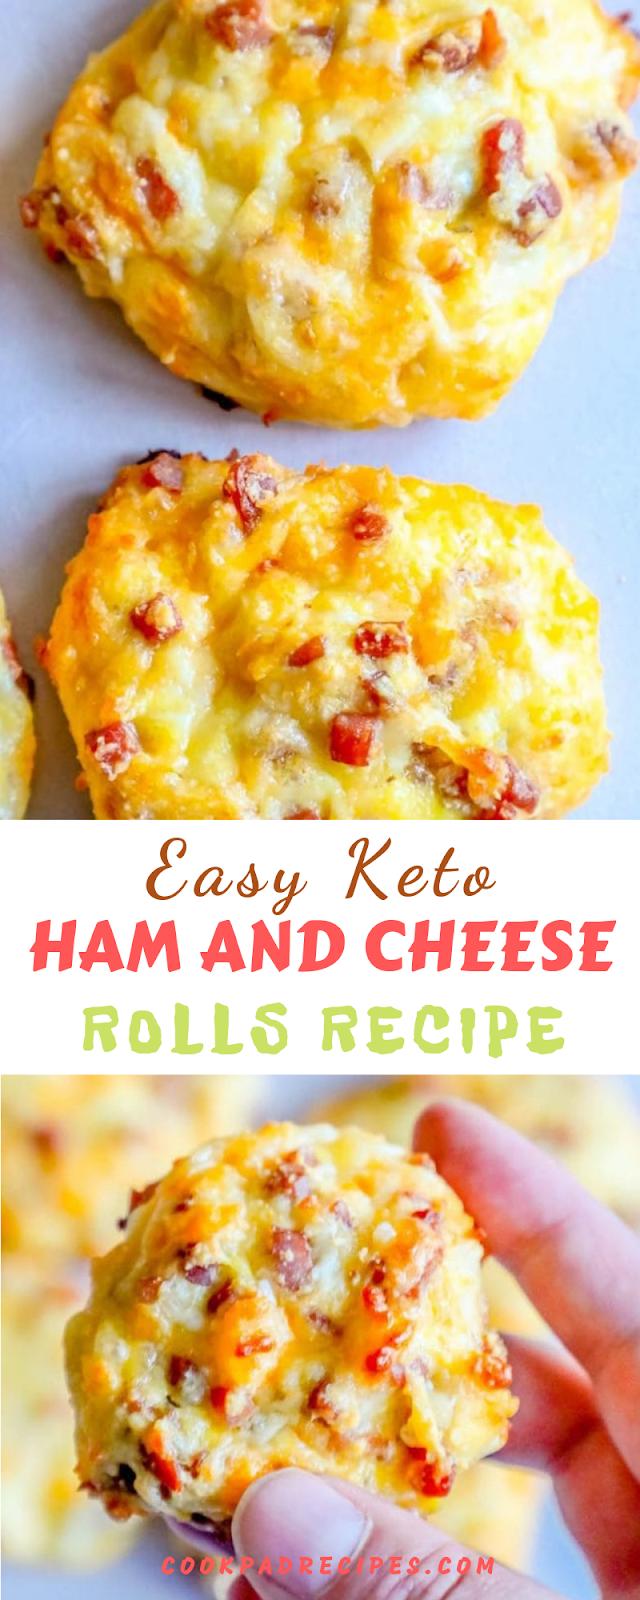 EASY KETO HAM AND CHEESE ROLLS RECIPE